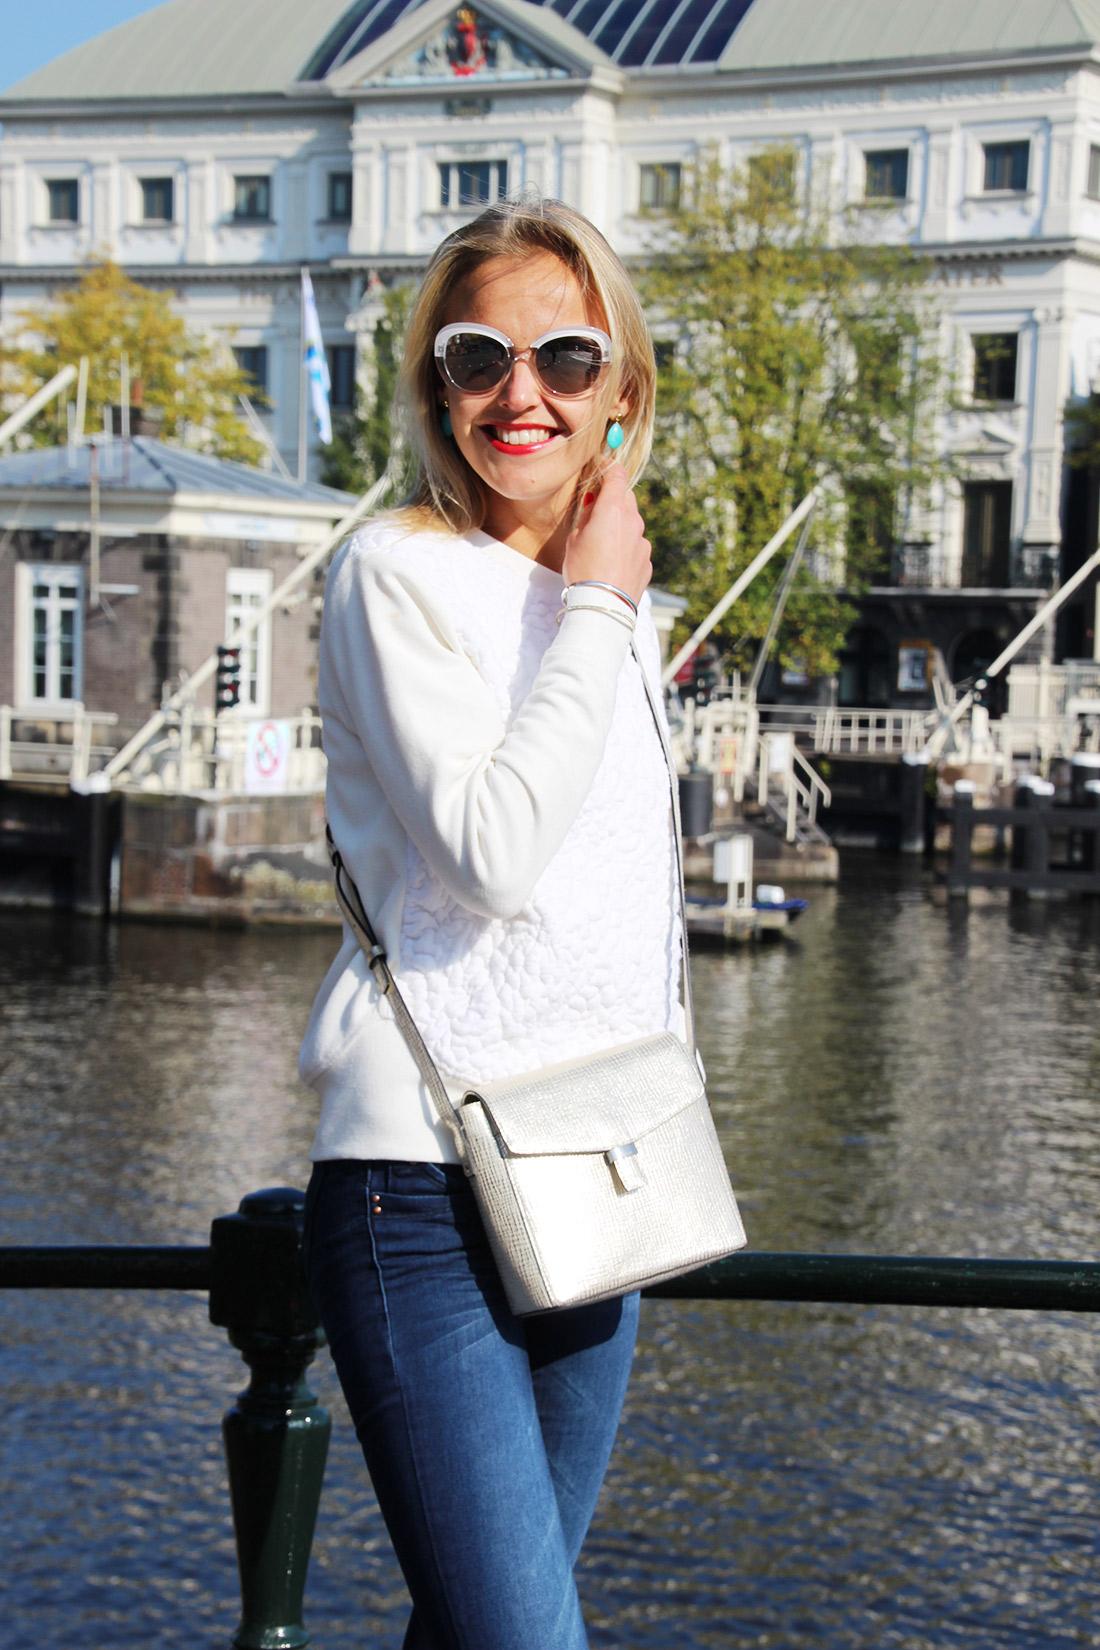 Bag-at-You---Fashion-blog---Denim-jeans---Ecco-bag---Autumn-Streetwear---Liujo-sunglasses